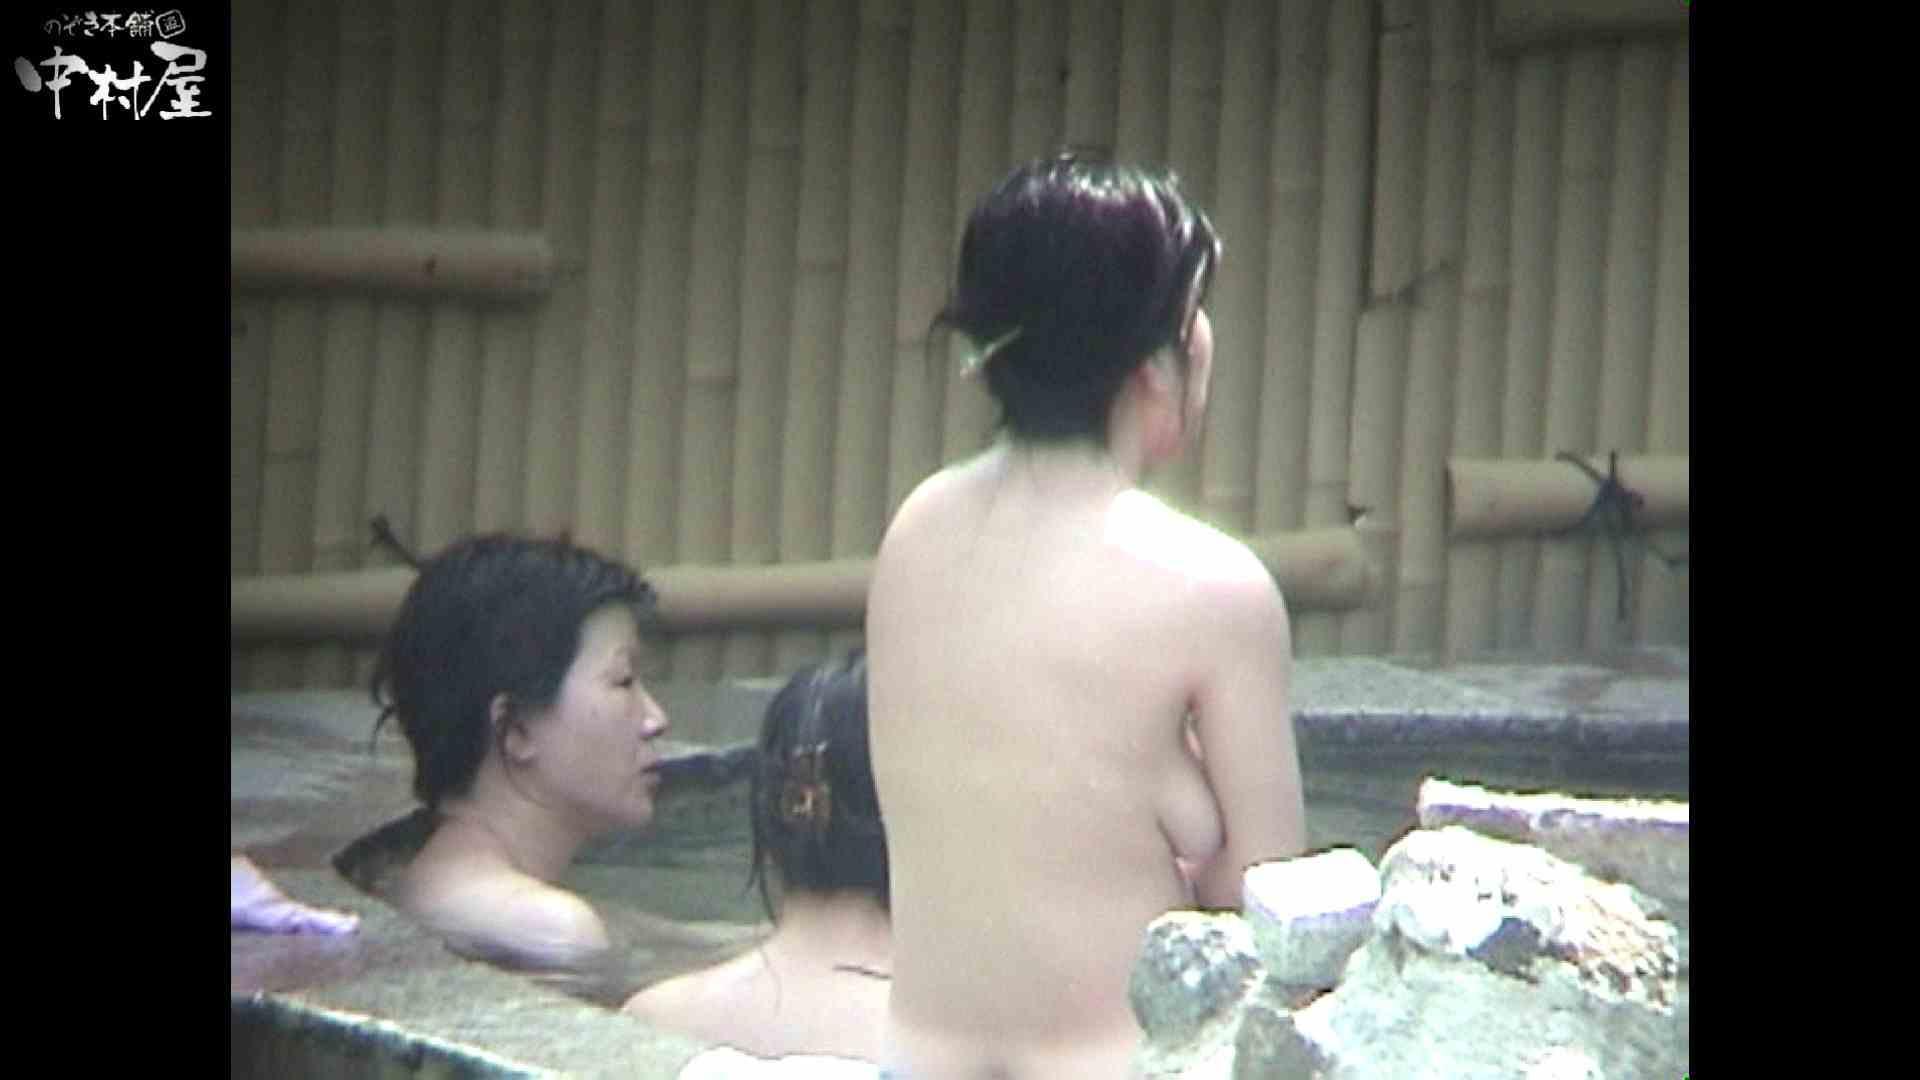 Aquaな露天風呂Vol.936 盗撮映像  110Pix 91